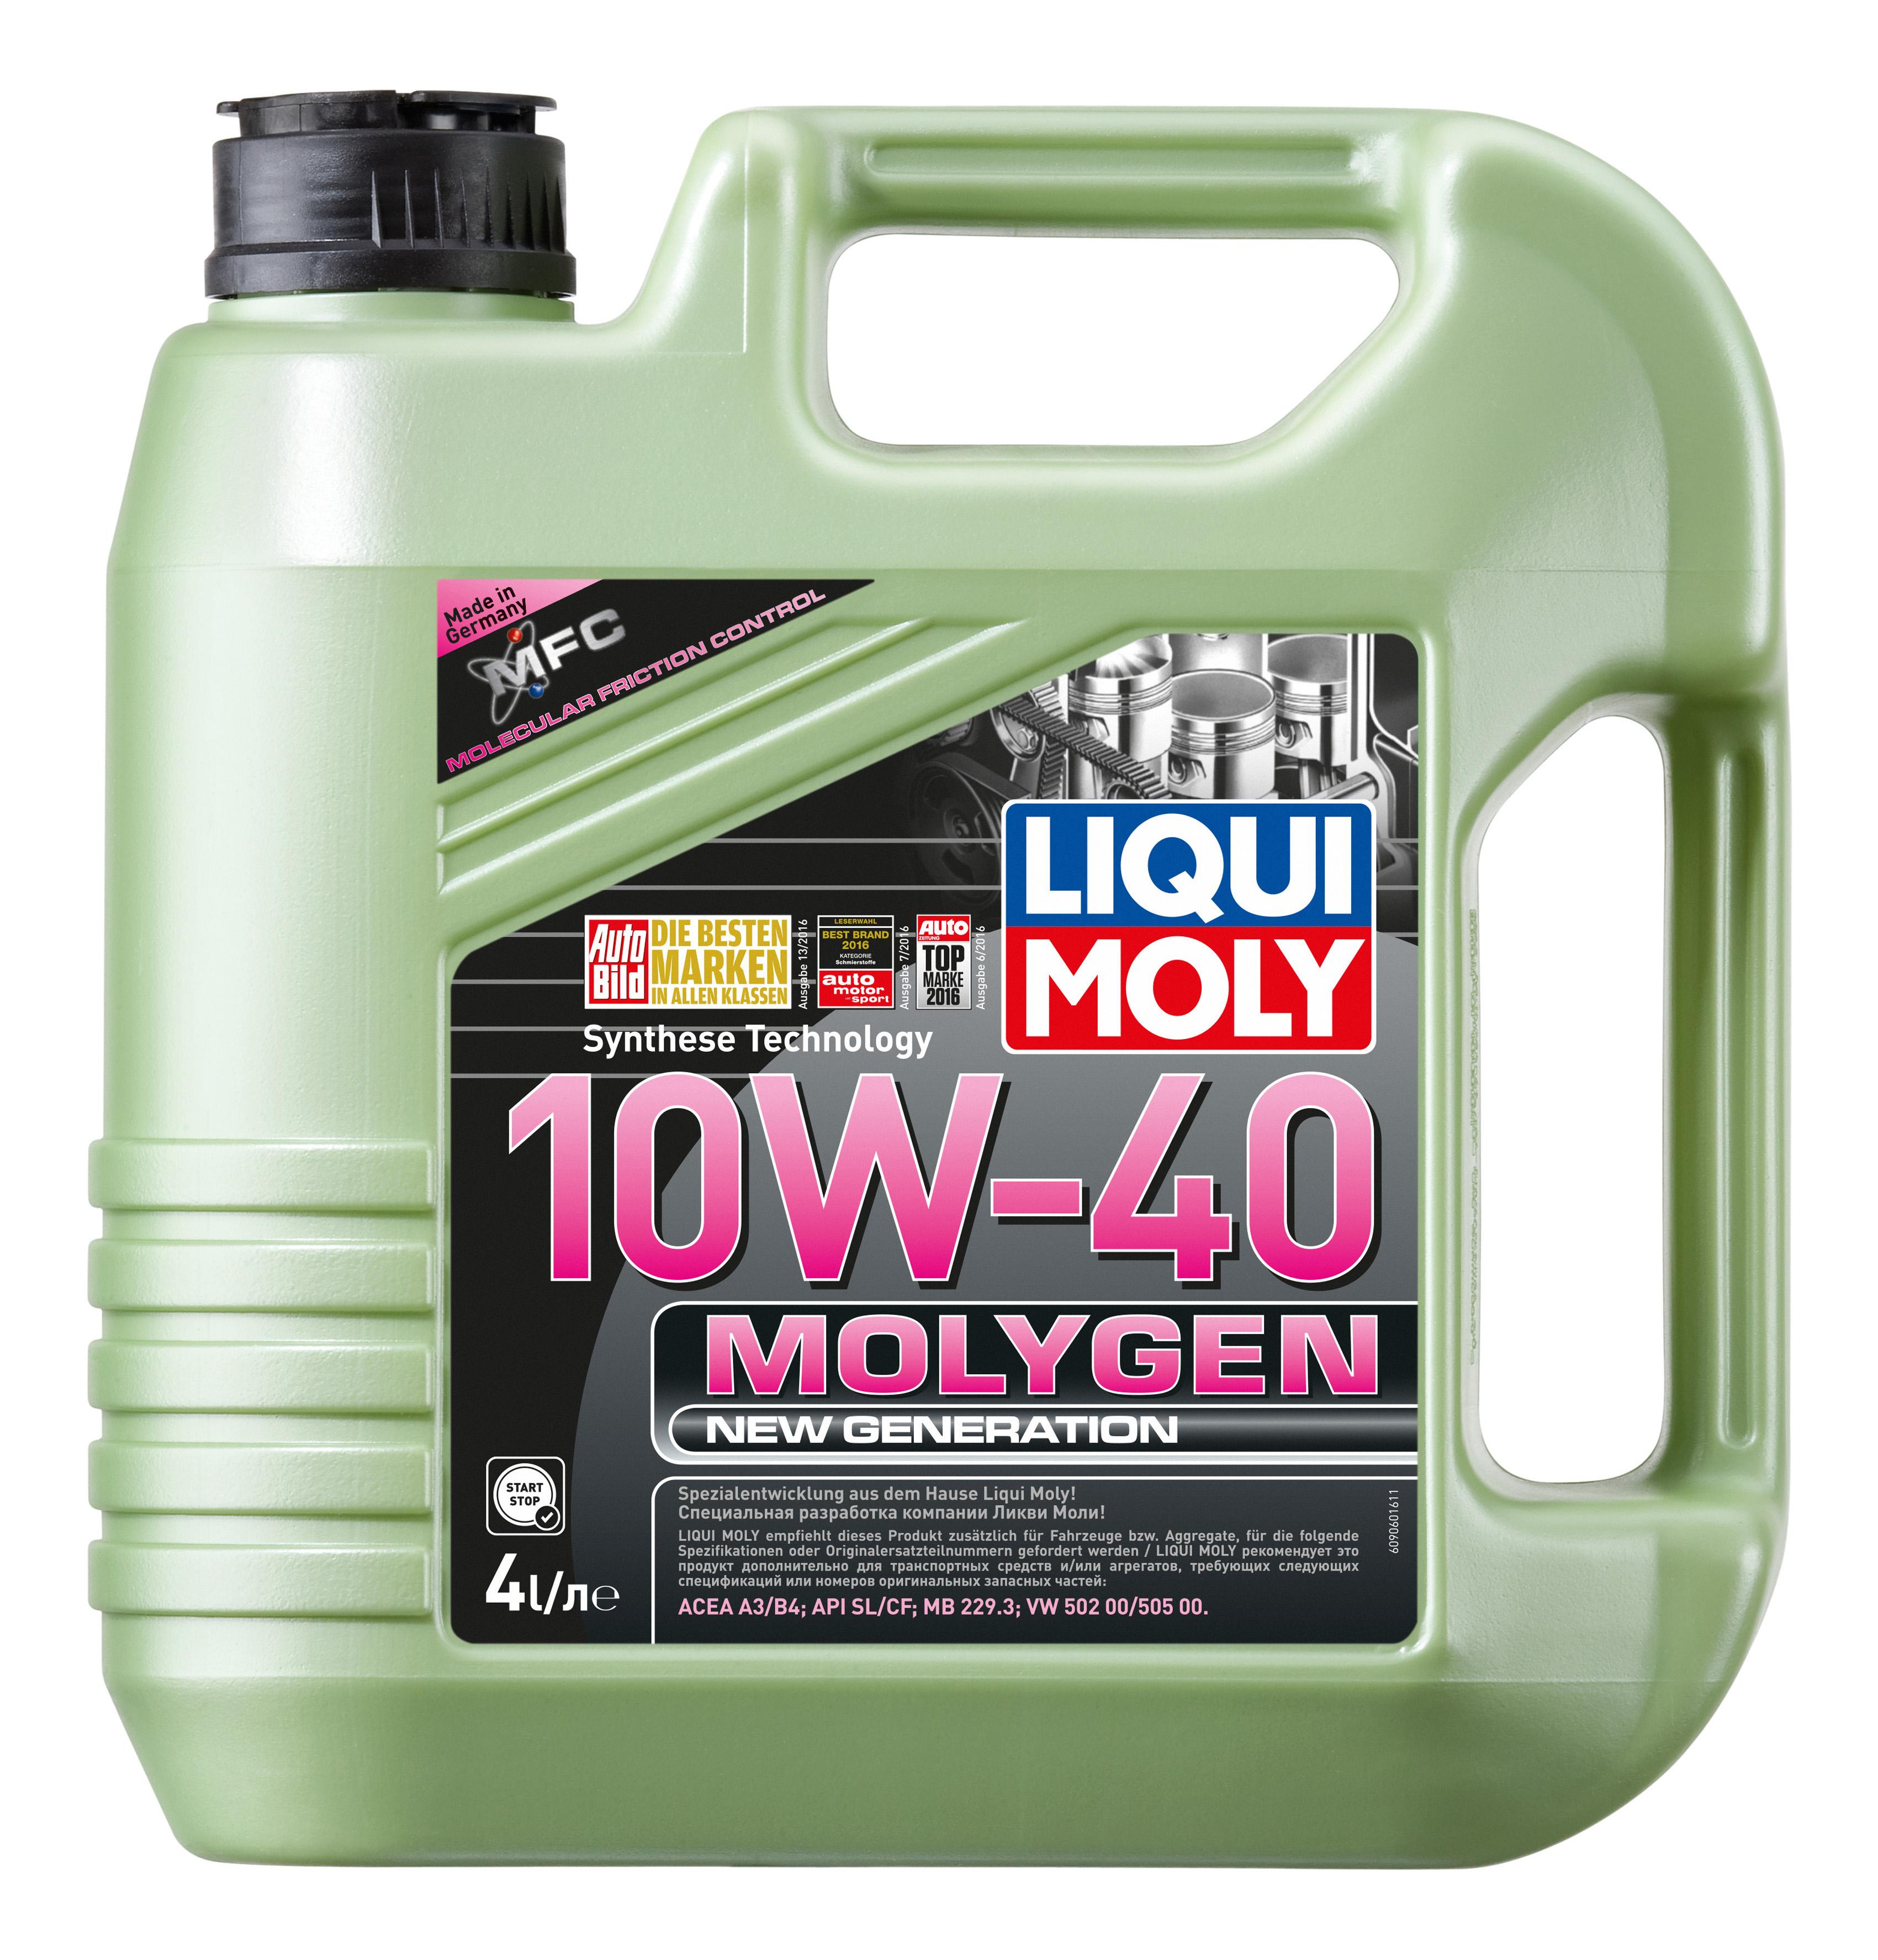 Моторное масло LIQUI MOLY Molygen New Generation 10w40 4л 9060